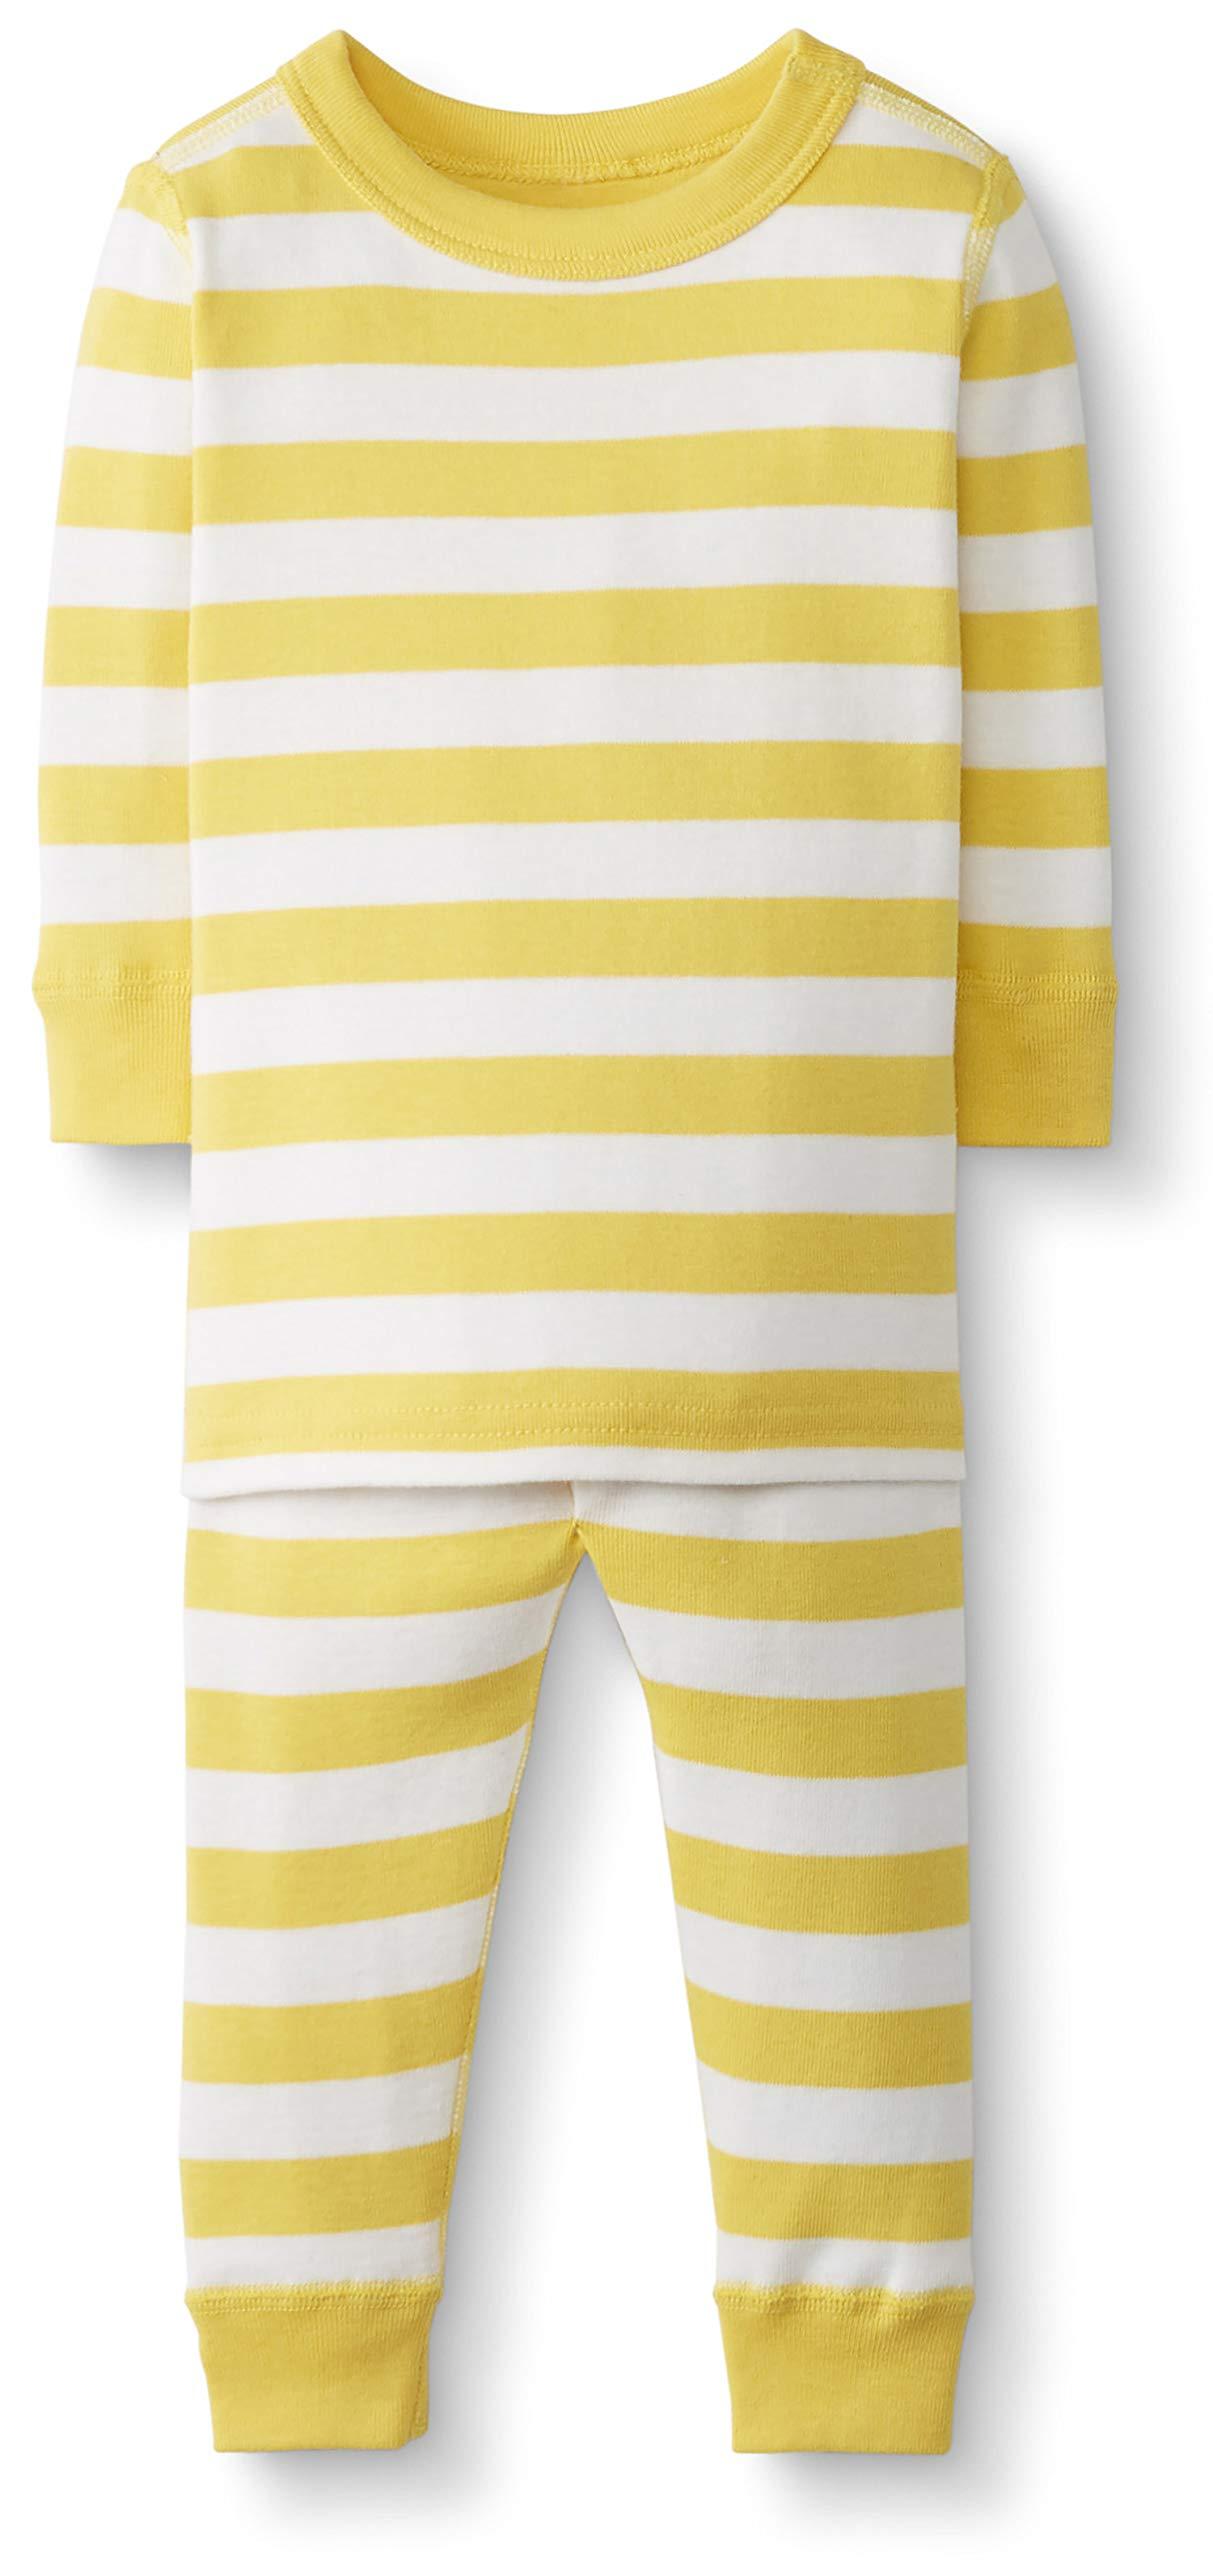 Hanna Andersson Baby/Toddler 2-Piece Organic Cotton Pajama Set Swedish Yellow/Hanna White -80